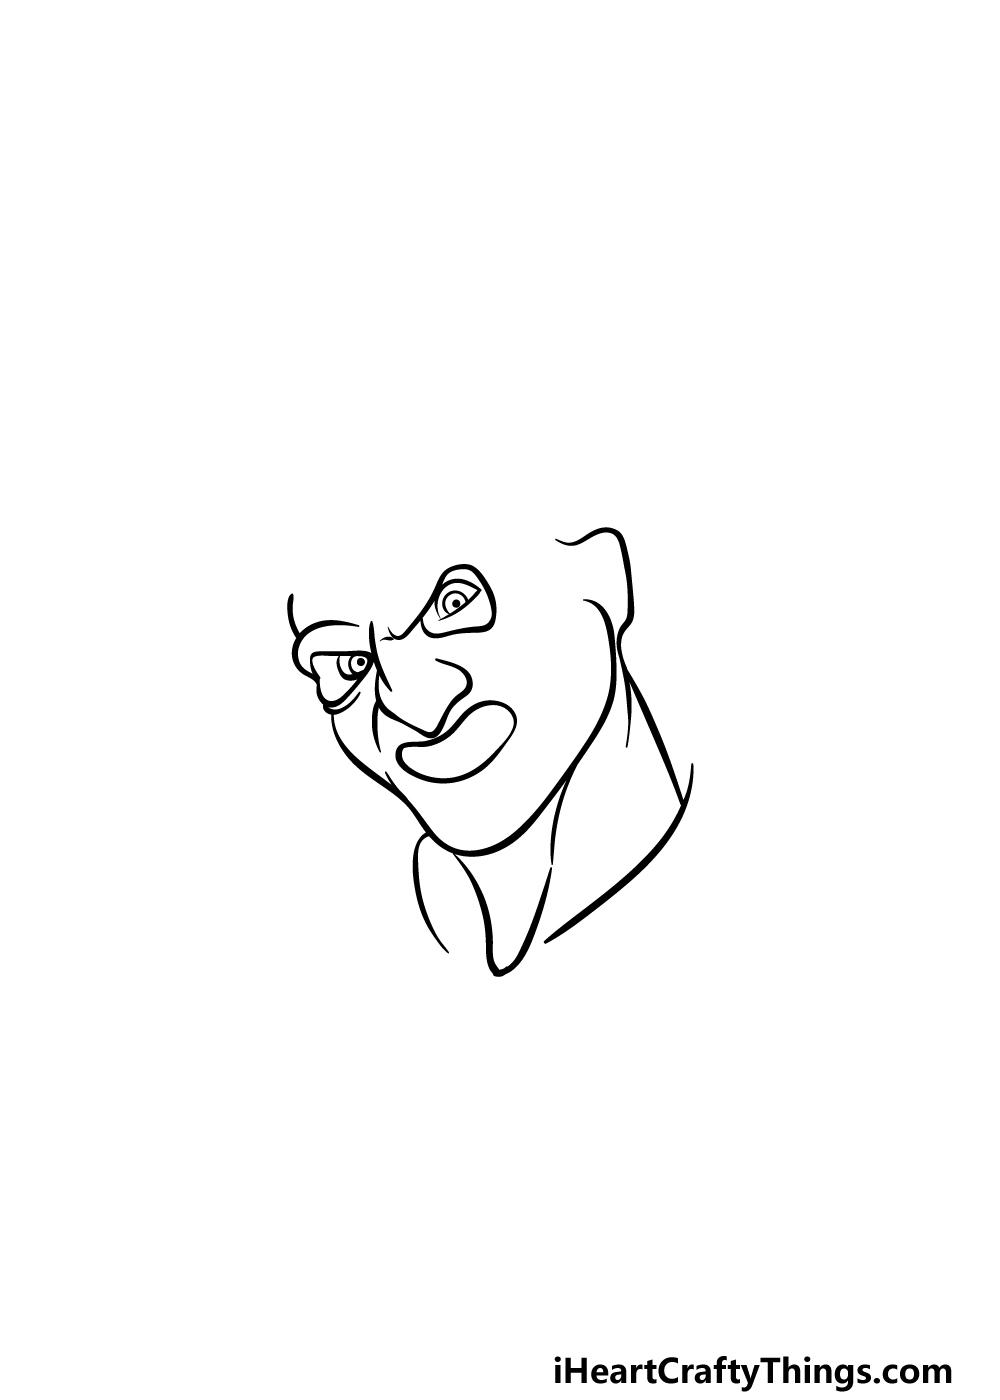 Drawing Freddy Krueger step 2